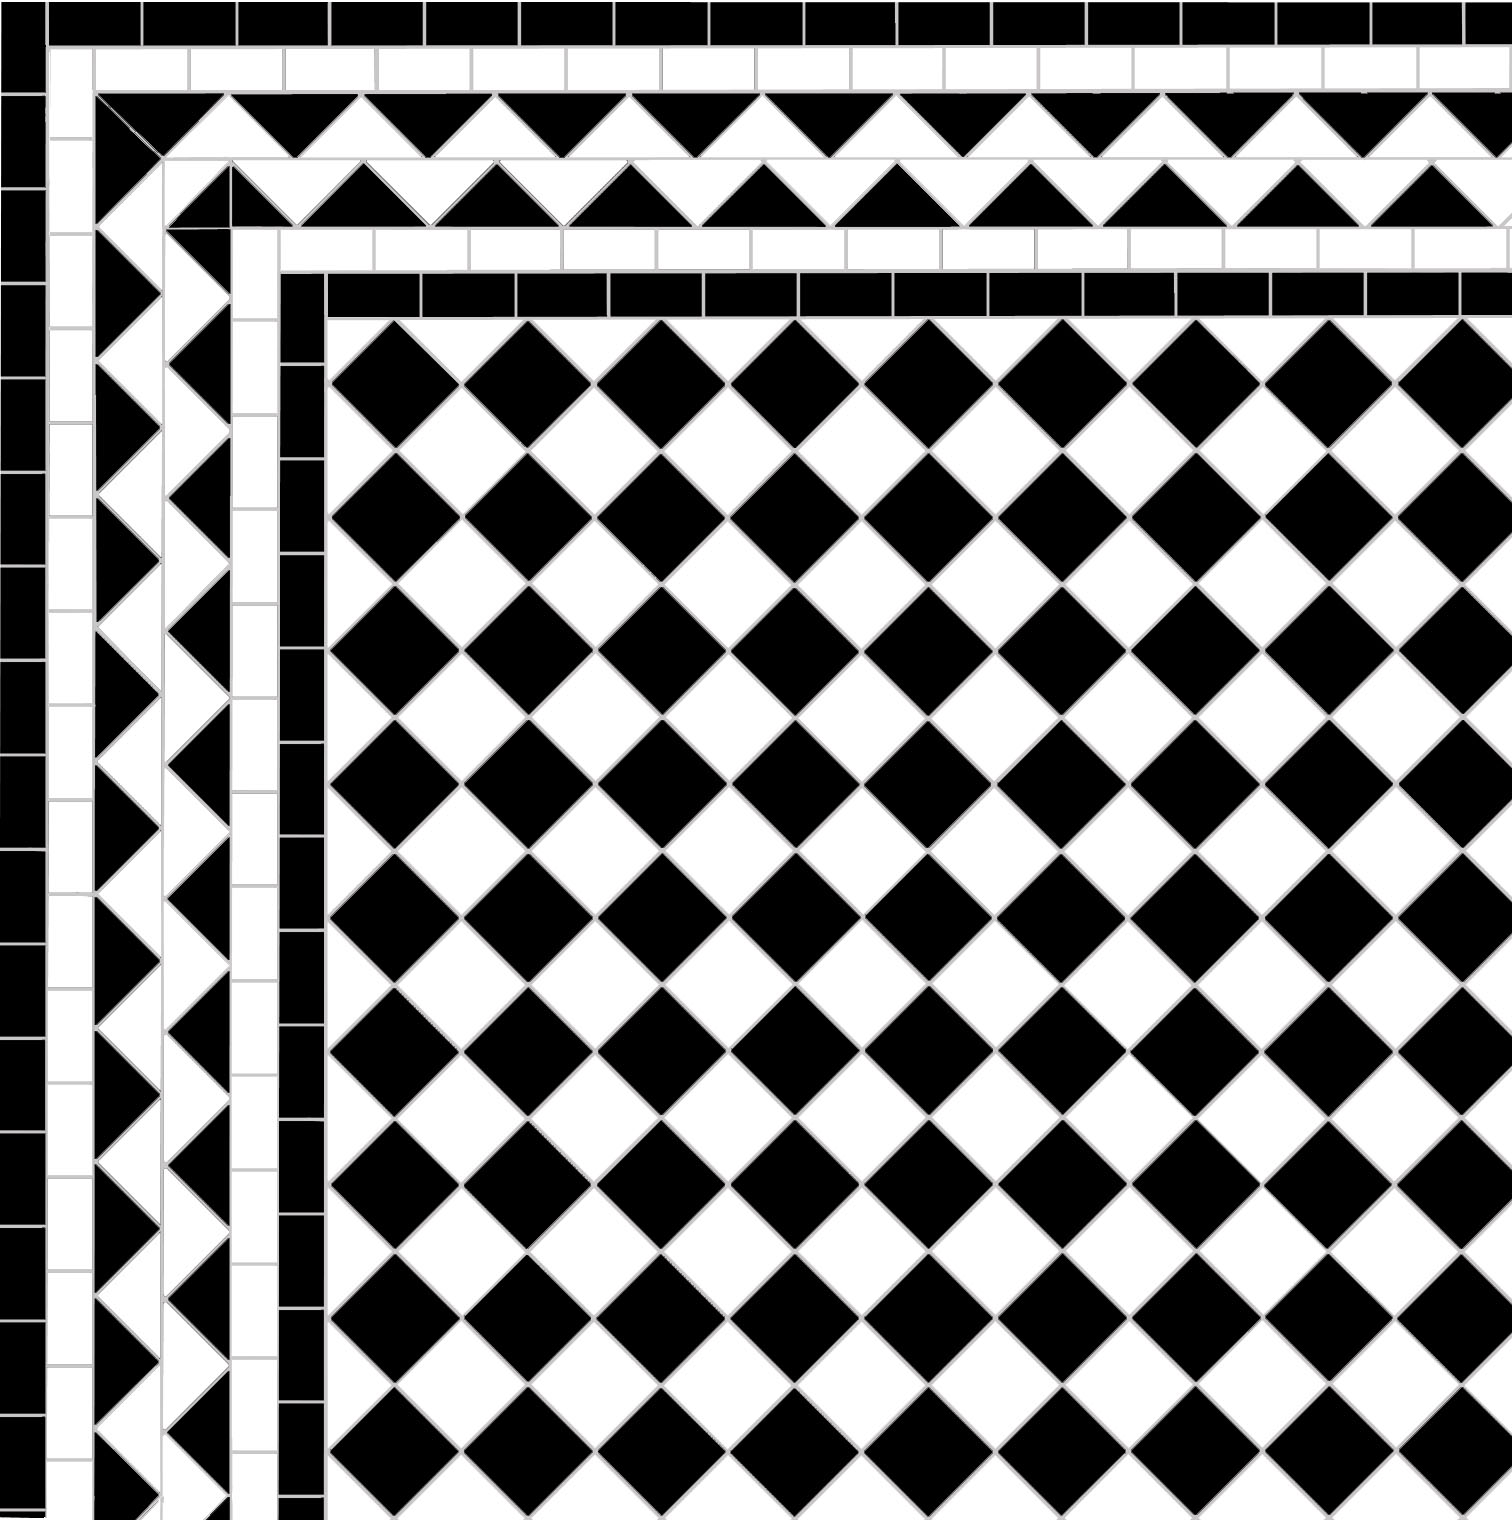 Chequer - White ZigZag Border 4 Lines